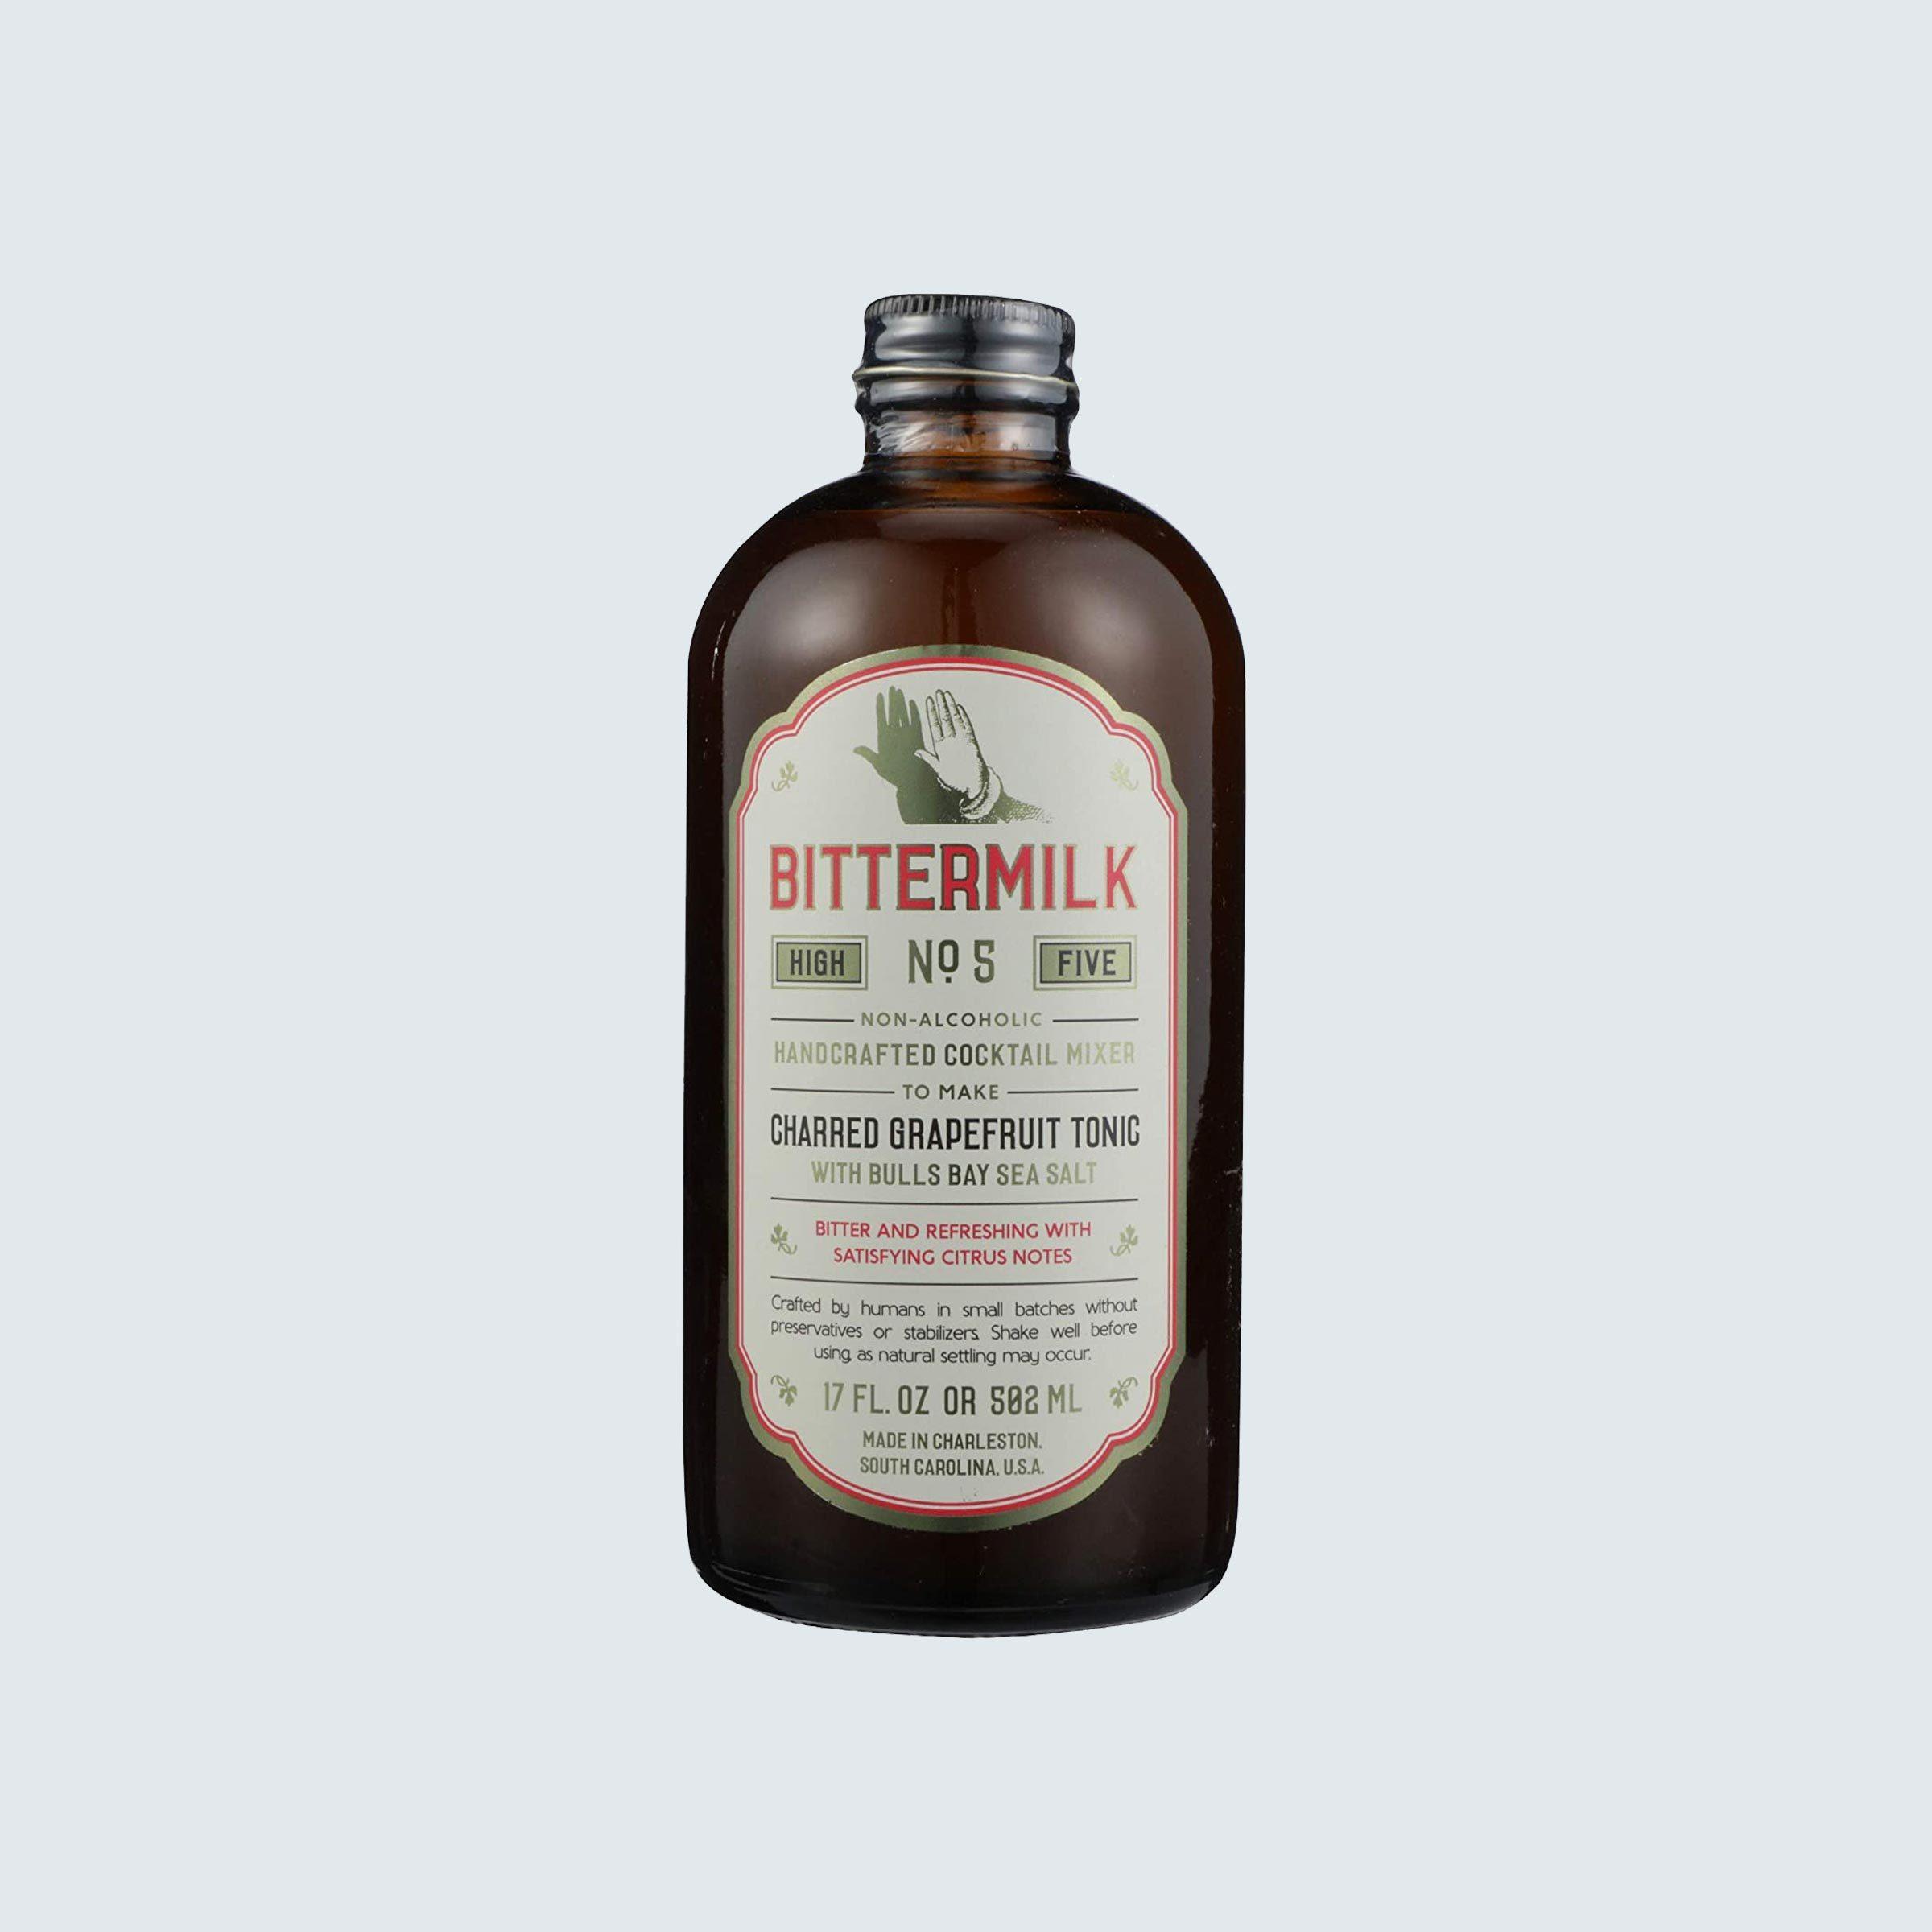 Bittermilk Charred Grapefruit Tonic Cocktail Mix